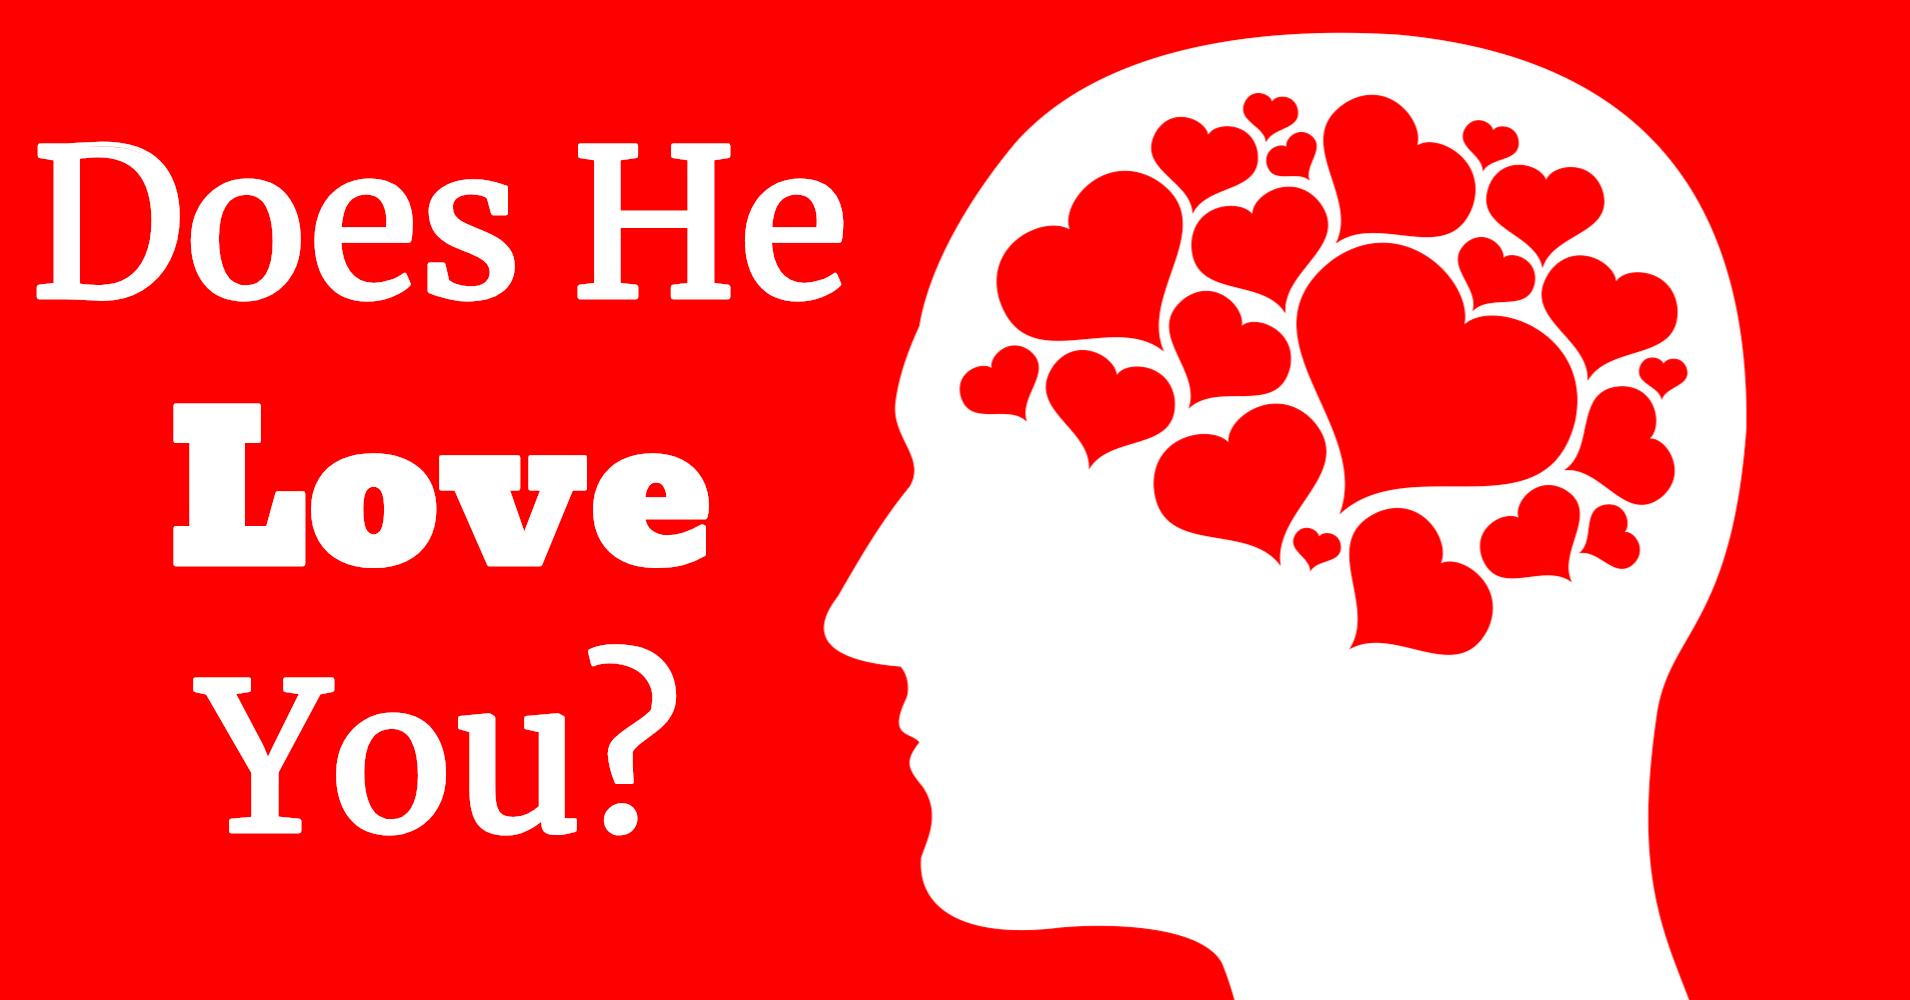 Does He Love You Quiz Quizony Com They are suitable for her and for him. does he love you quiz quizony com